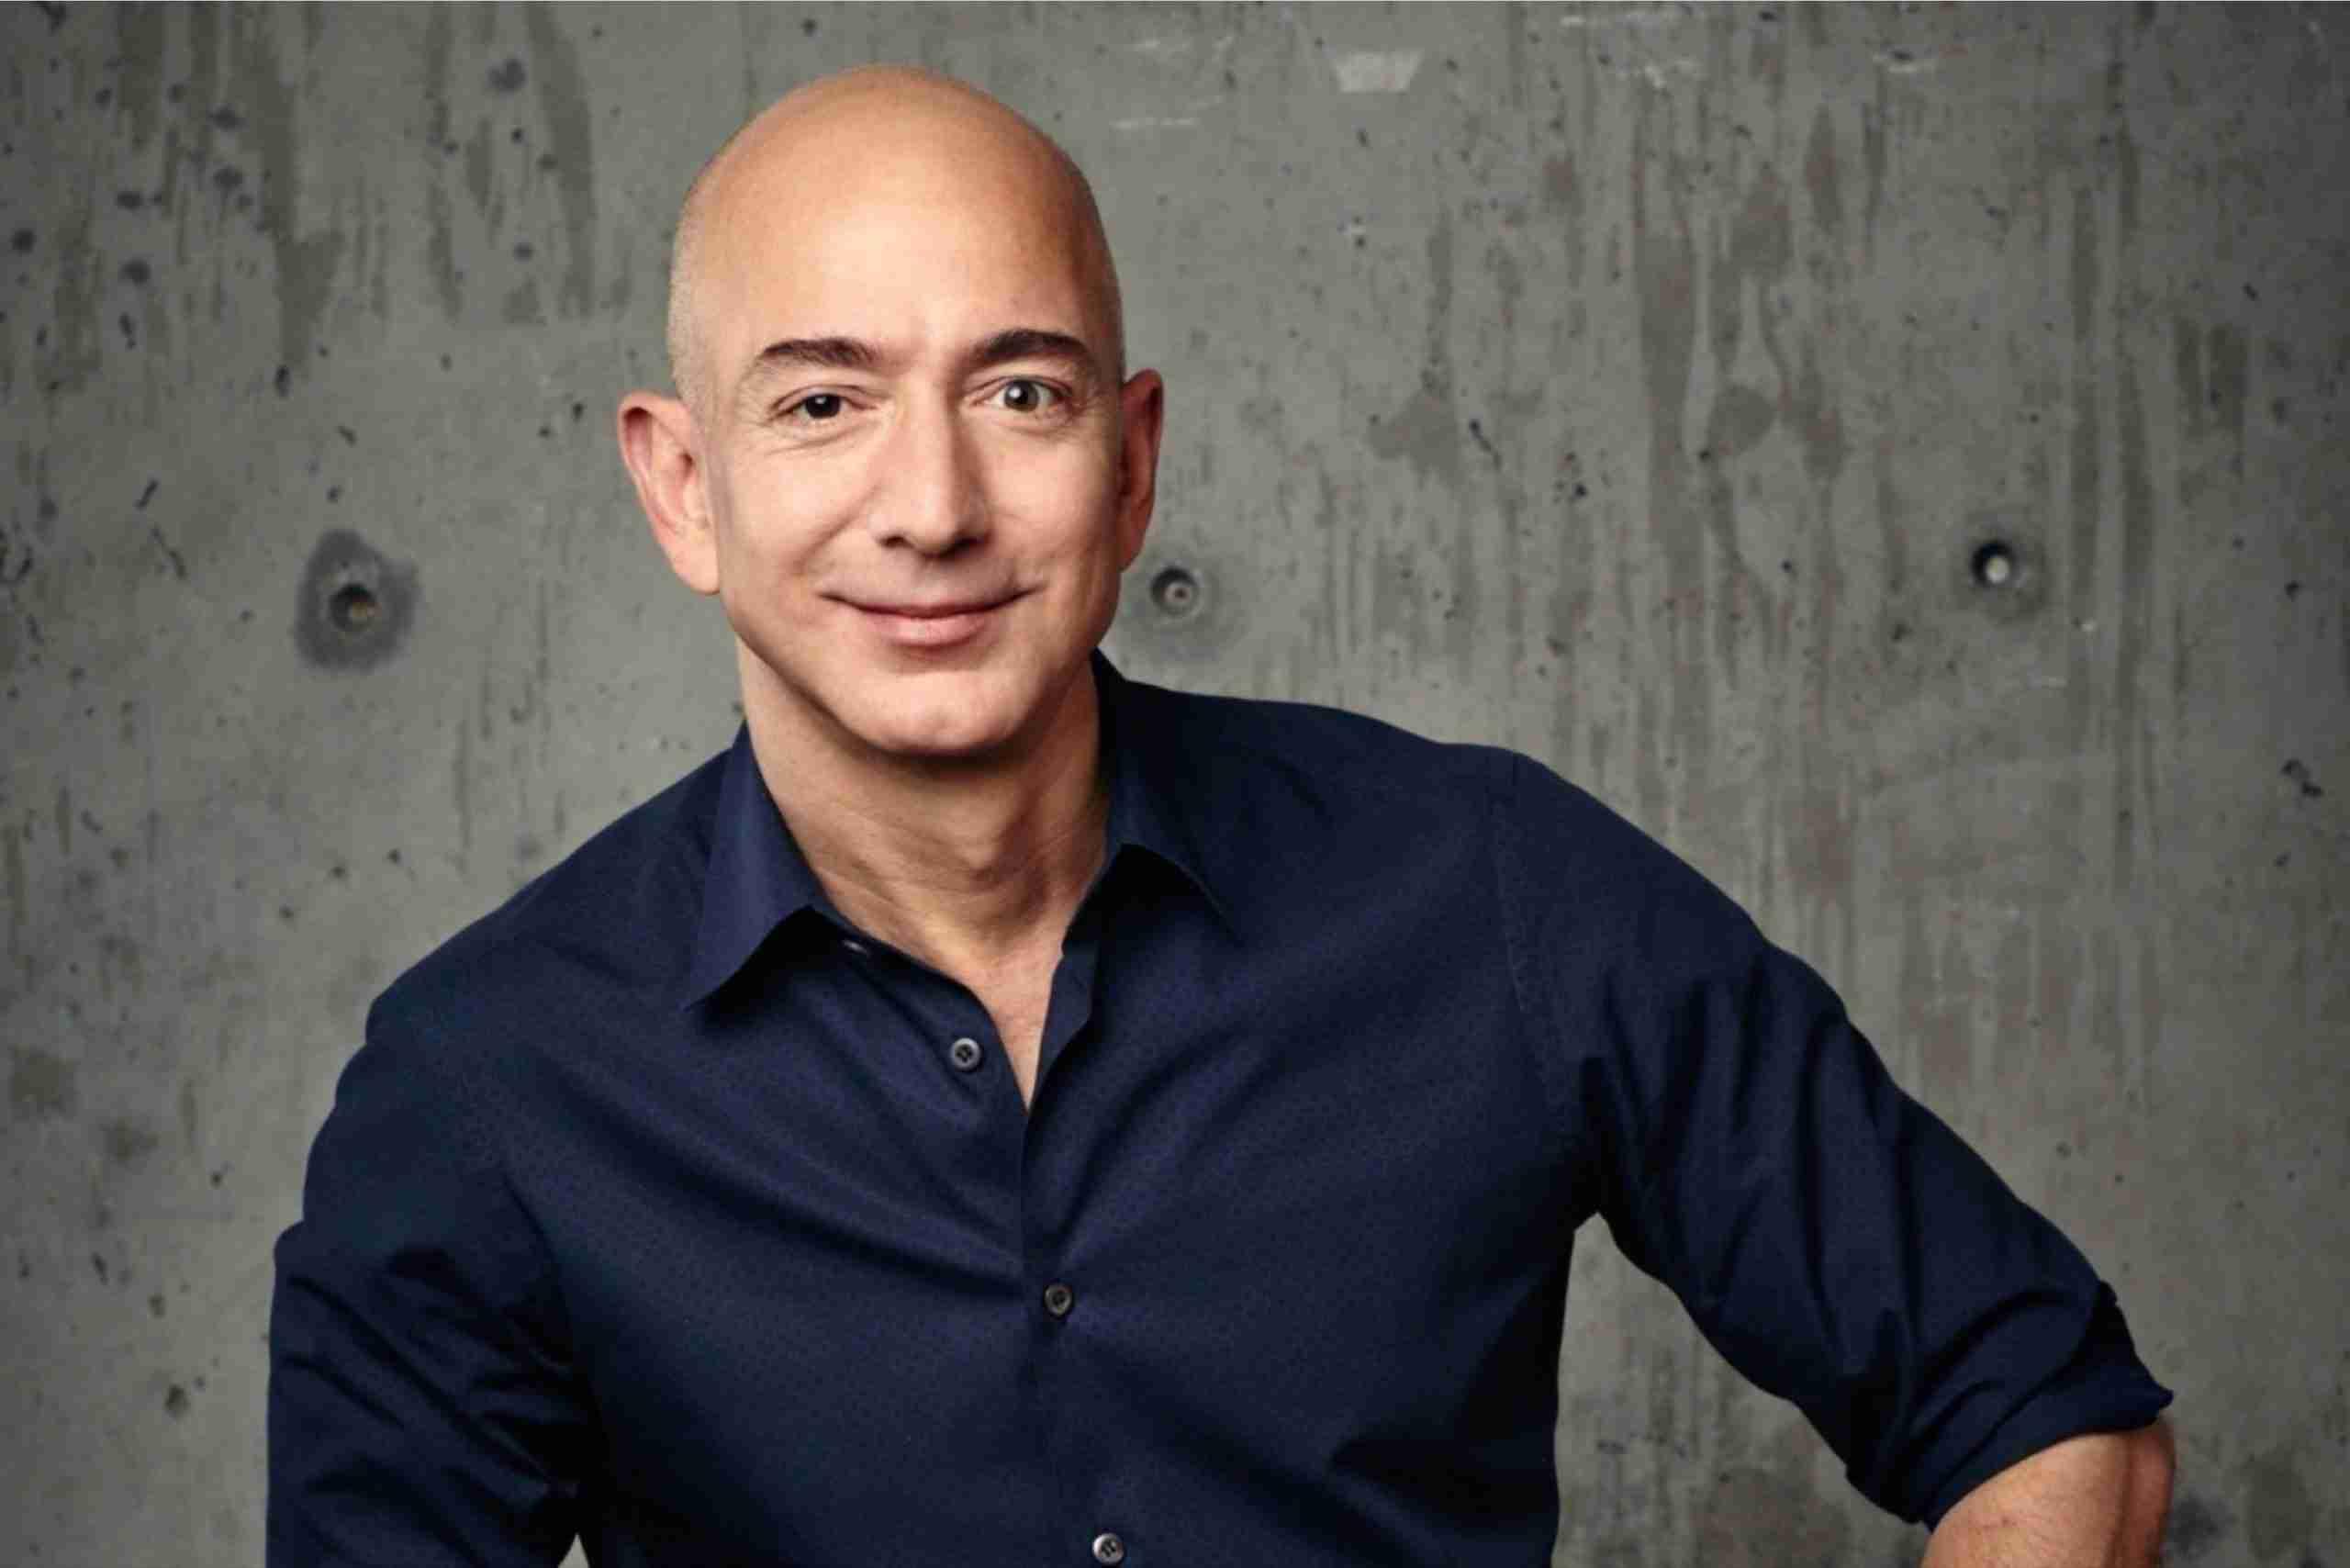 Jeff Bezos books